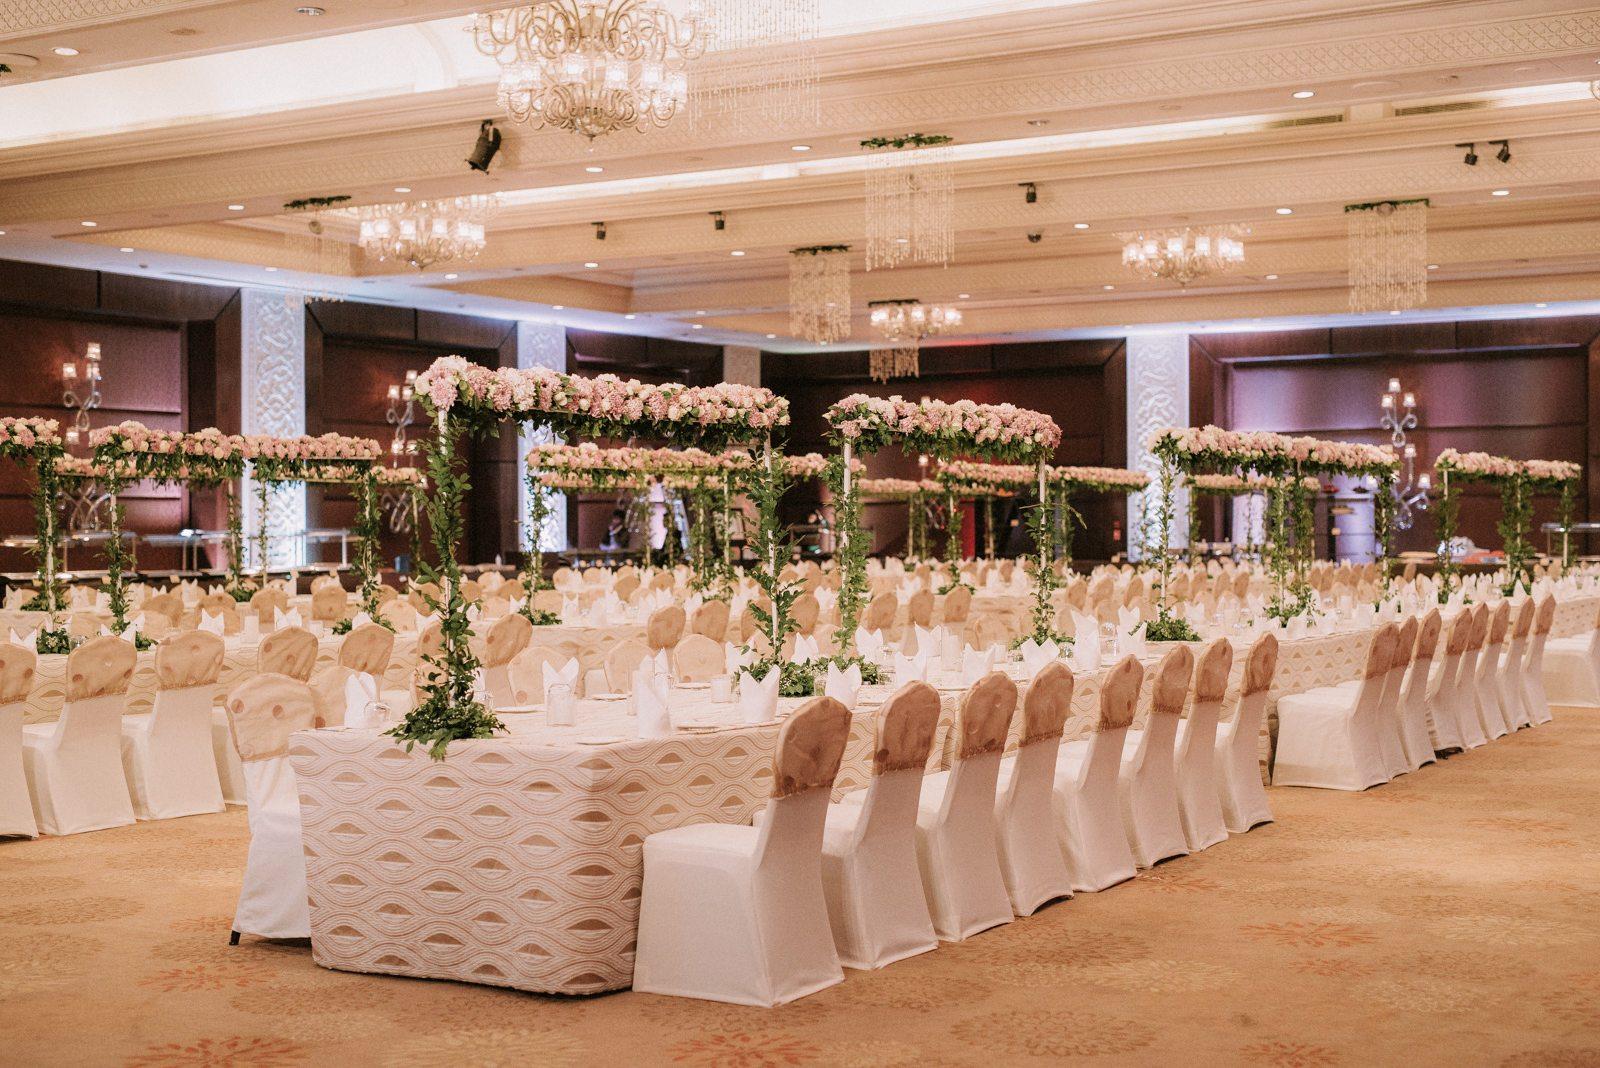 wedding in india - destination wedding photographer-273.jpg